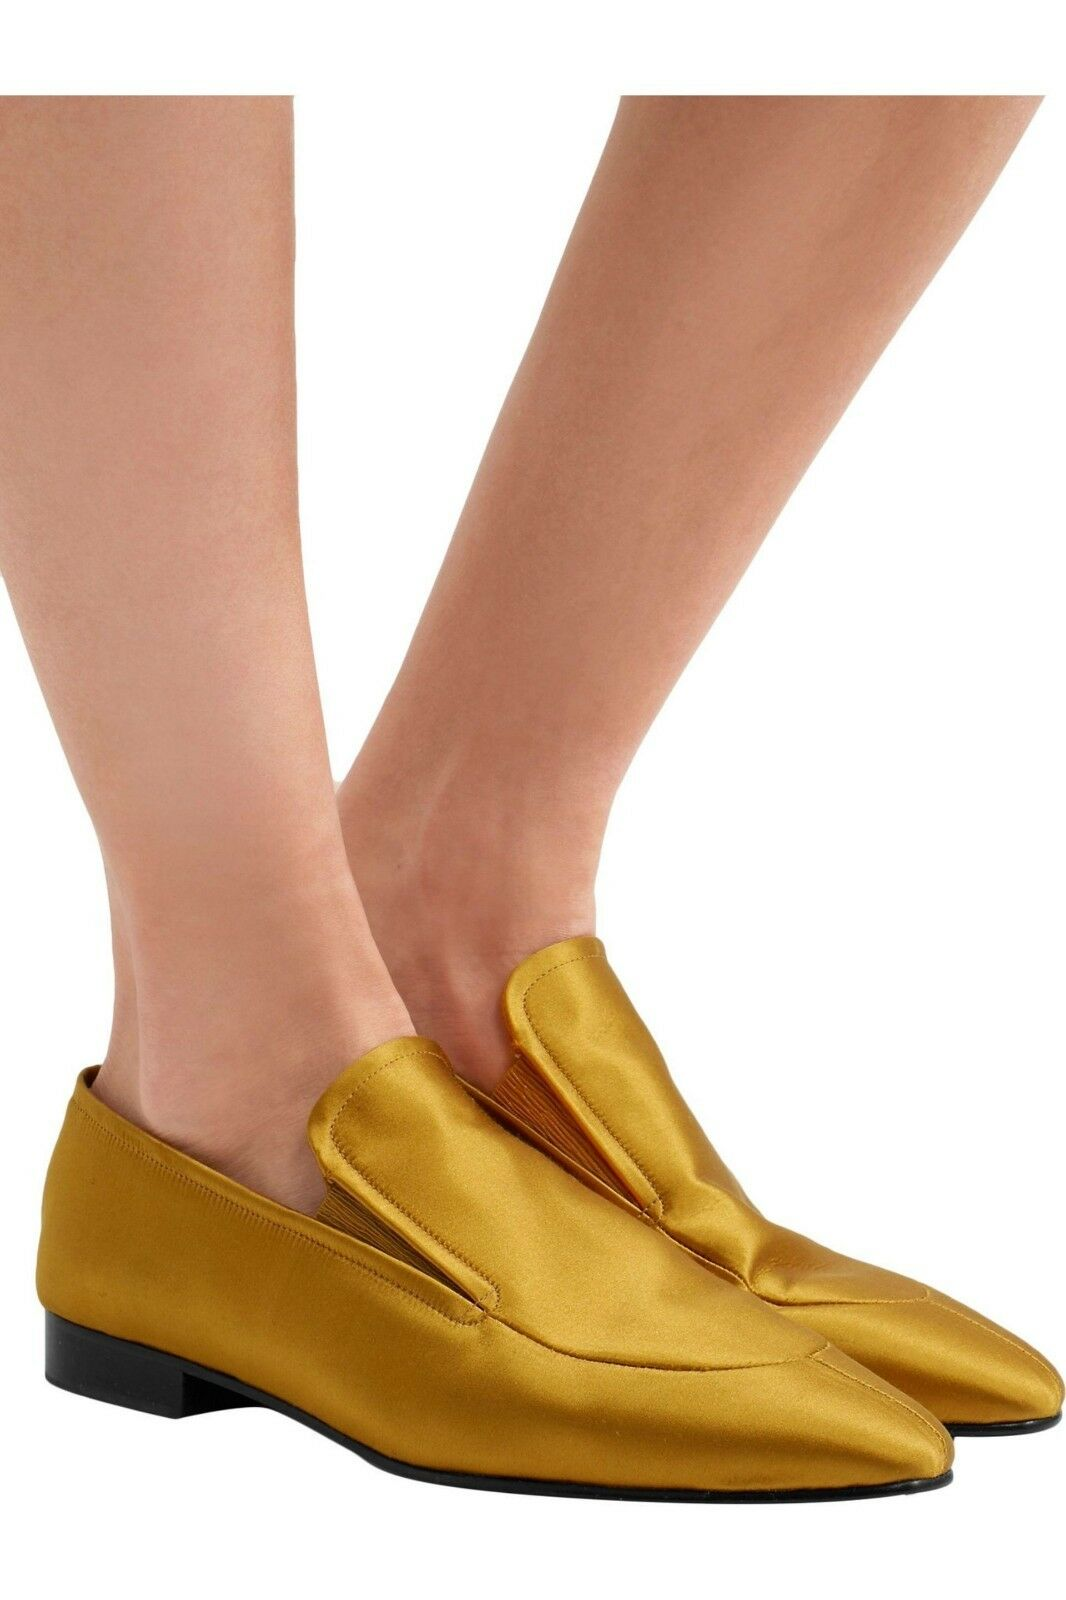 Nuevo  530 Caléndula Josephs para Mujer satinado anthropologie Caléndula 530 Mocasines Zapatos Talla 39 9 Italia 6d1f9e